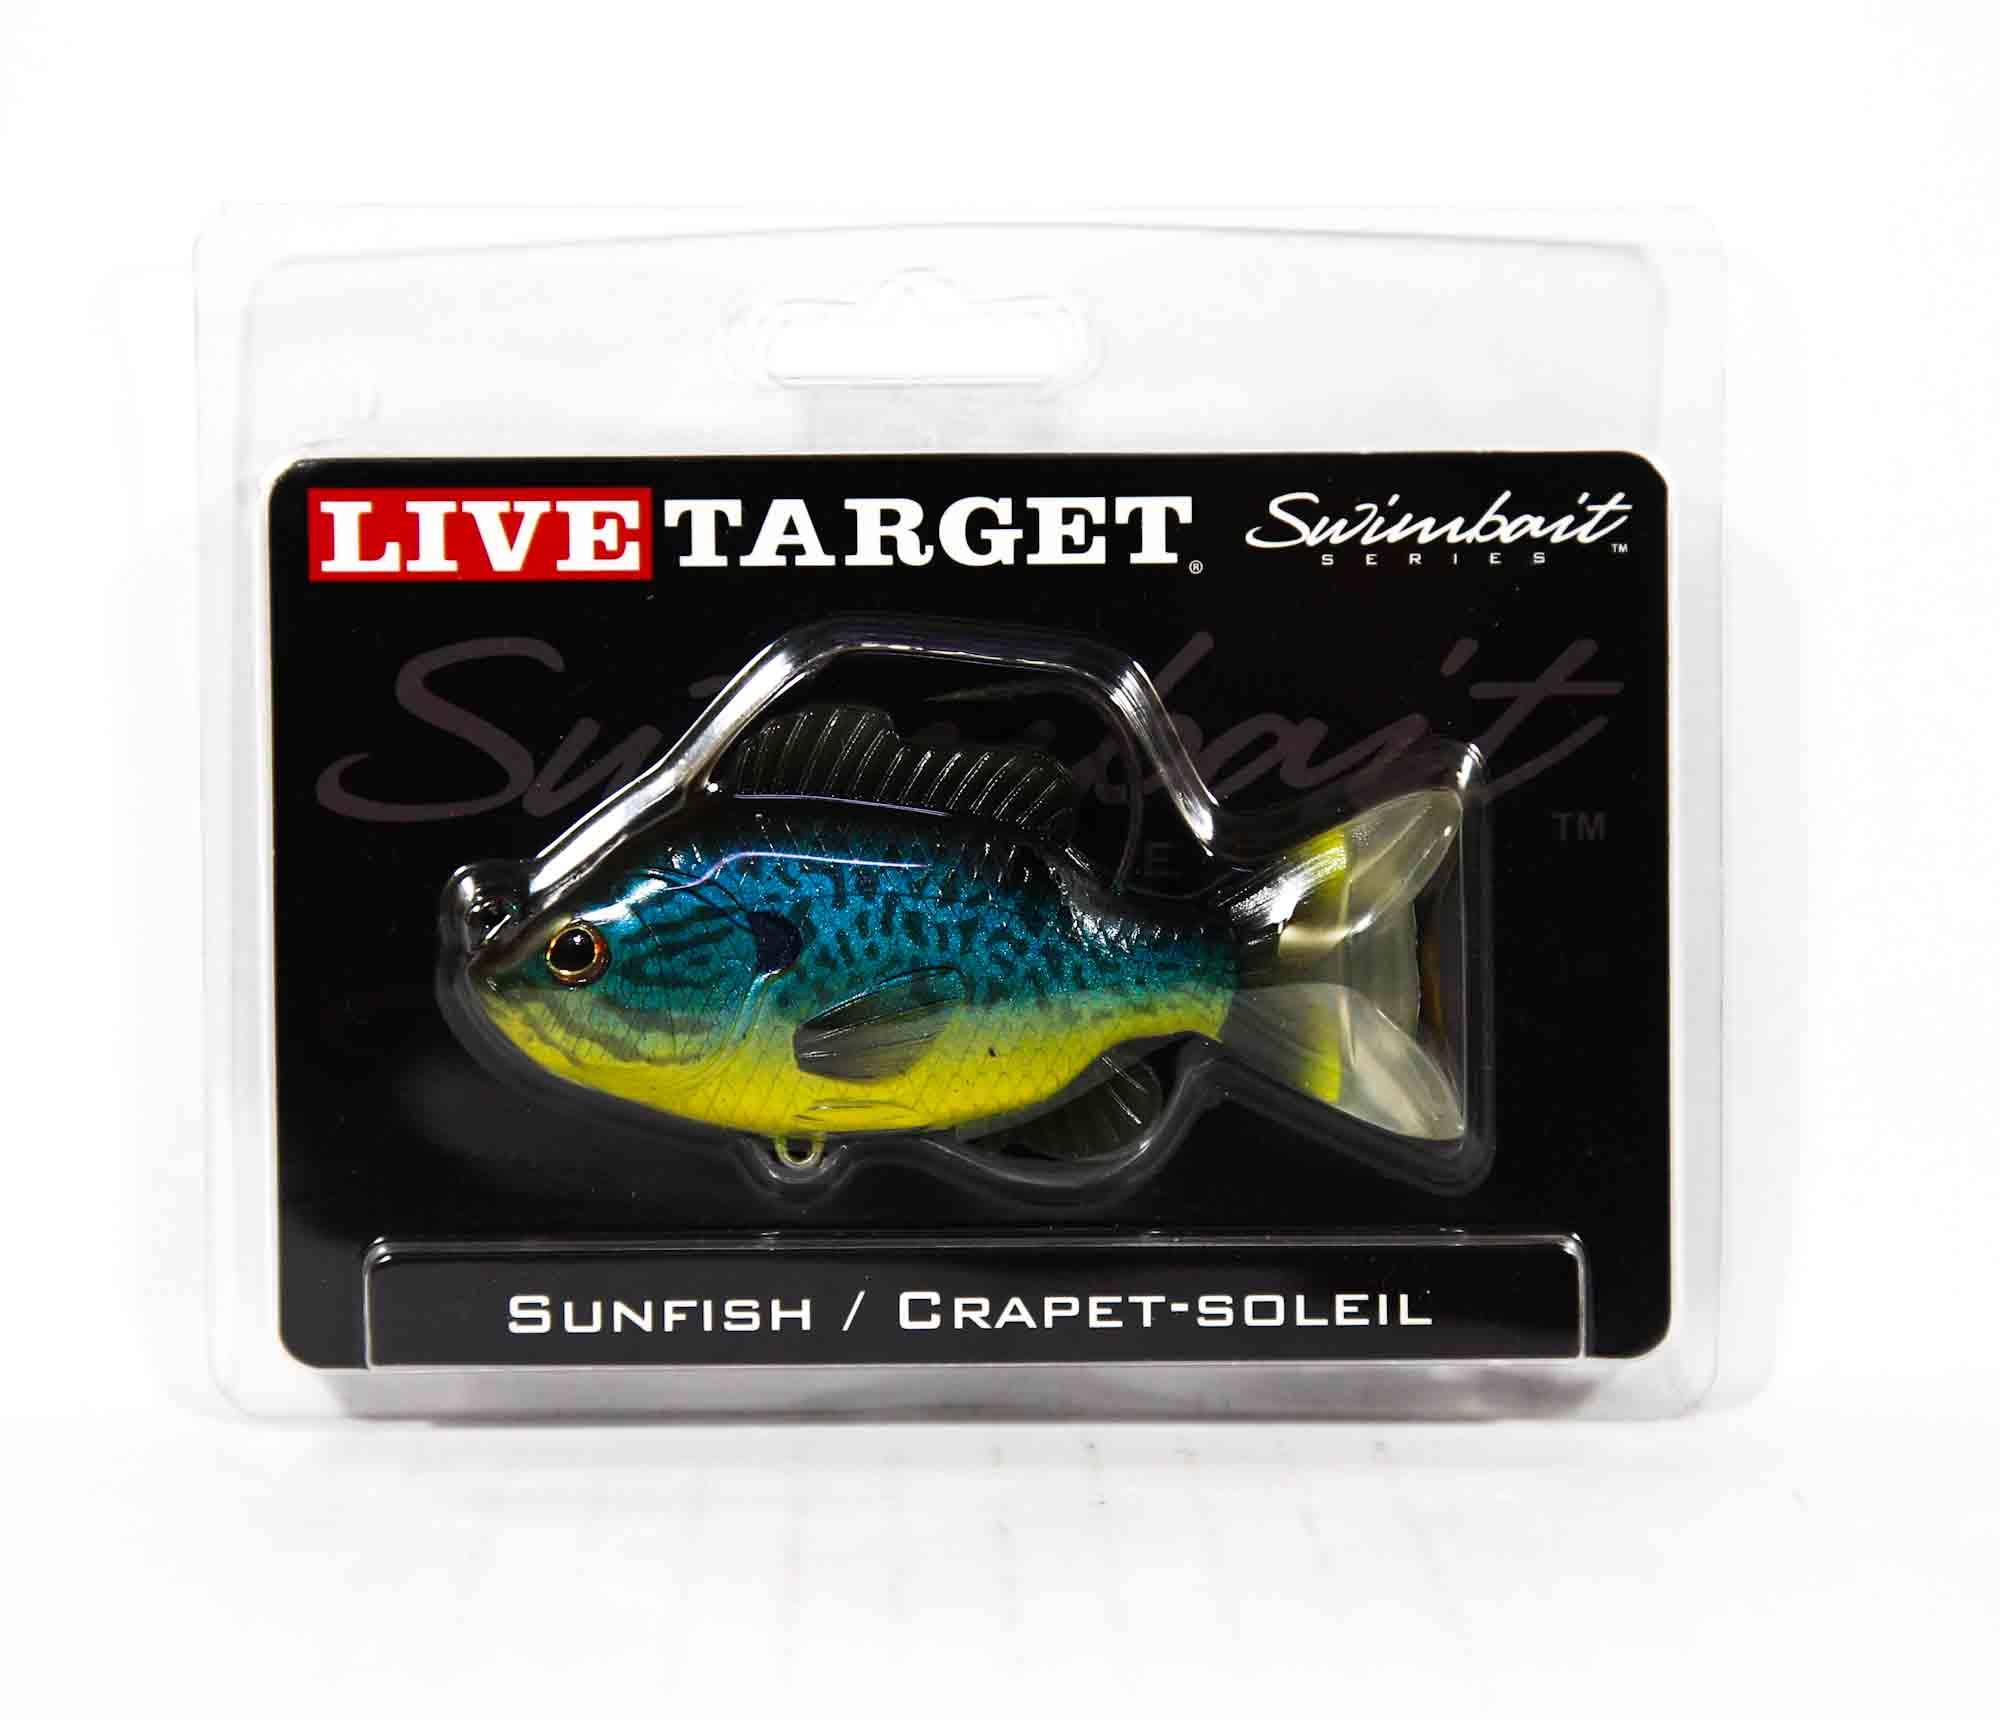 Live Target SFS90MS555 Swimbait Sunfish 3.5 Inch Blue Yellow Pumpkinseed (0613)